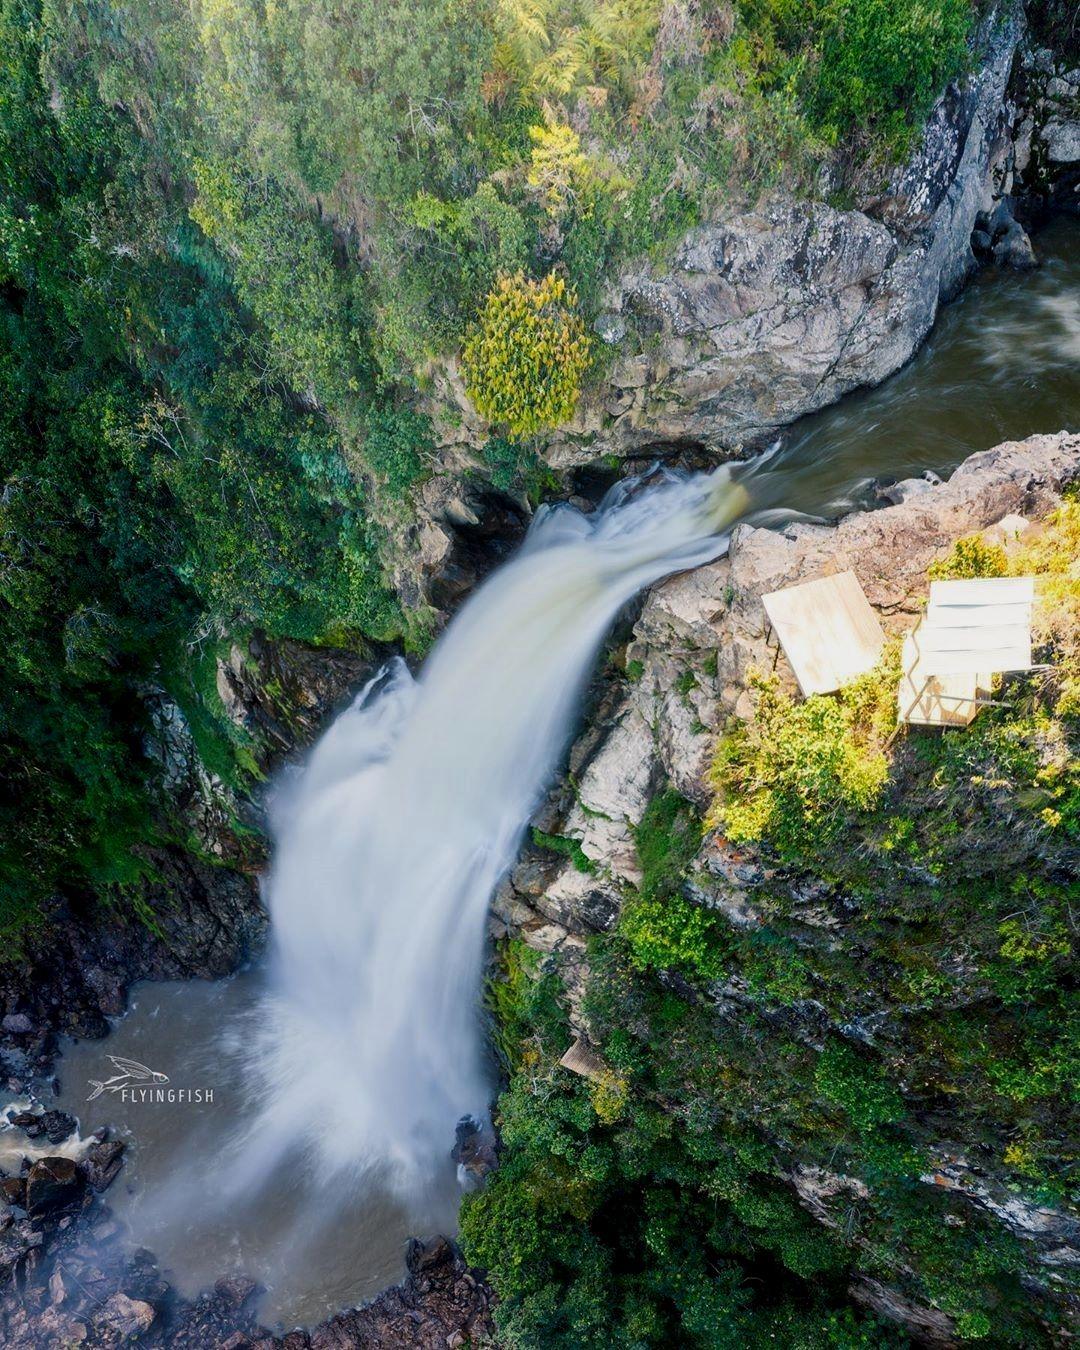 L E A P | O F | F A I T H ↟ ↟ This fall is over 80 meters tally ↟ ↟ ↟ #aerialphoto #aerialphotography #waterfallscollective #waterfallwednesday #skybangerz #drones_captures #elsaltodelbuey #travelphotography #theimaged #flywithpolarpro #worldshotz #earthfocus #fantastic_universe #droneglobe #world_shotz #eclectic_shotz #waterfallsofinstagram #roamwild19 #roamtheplanet #travelcolombia #apn589 #beautifuldestinations #captureperfection